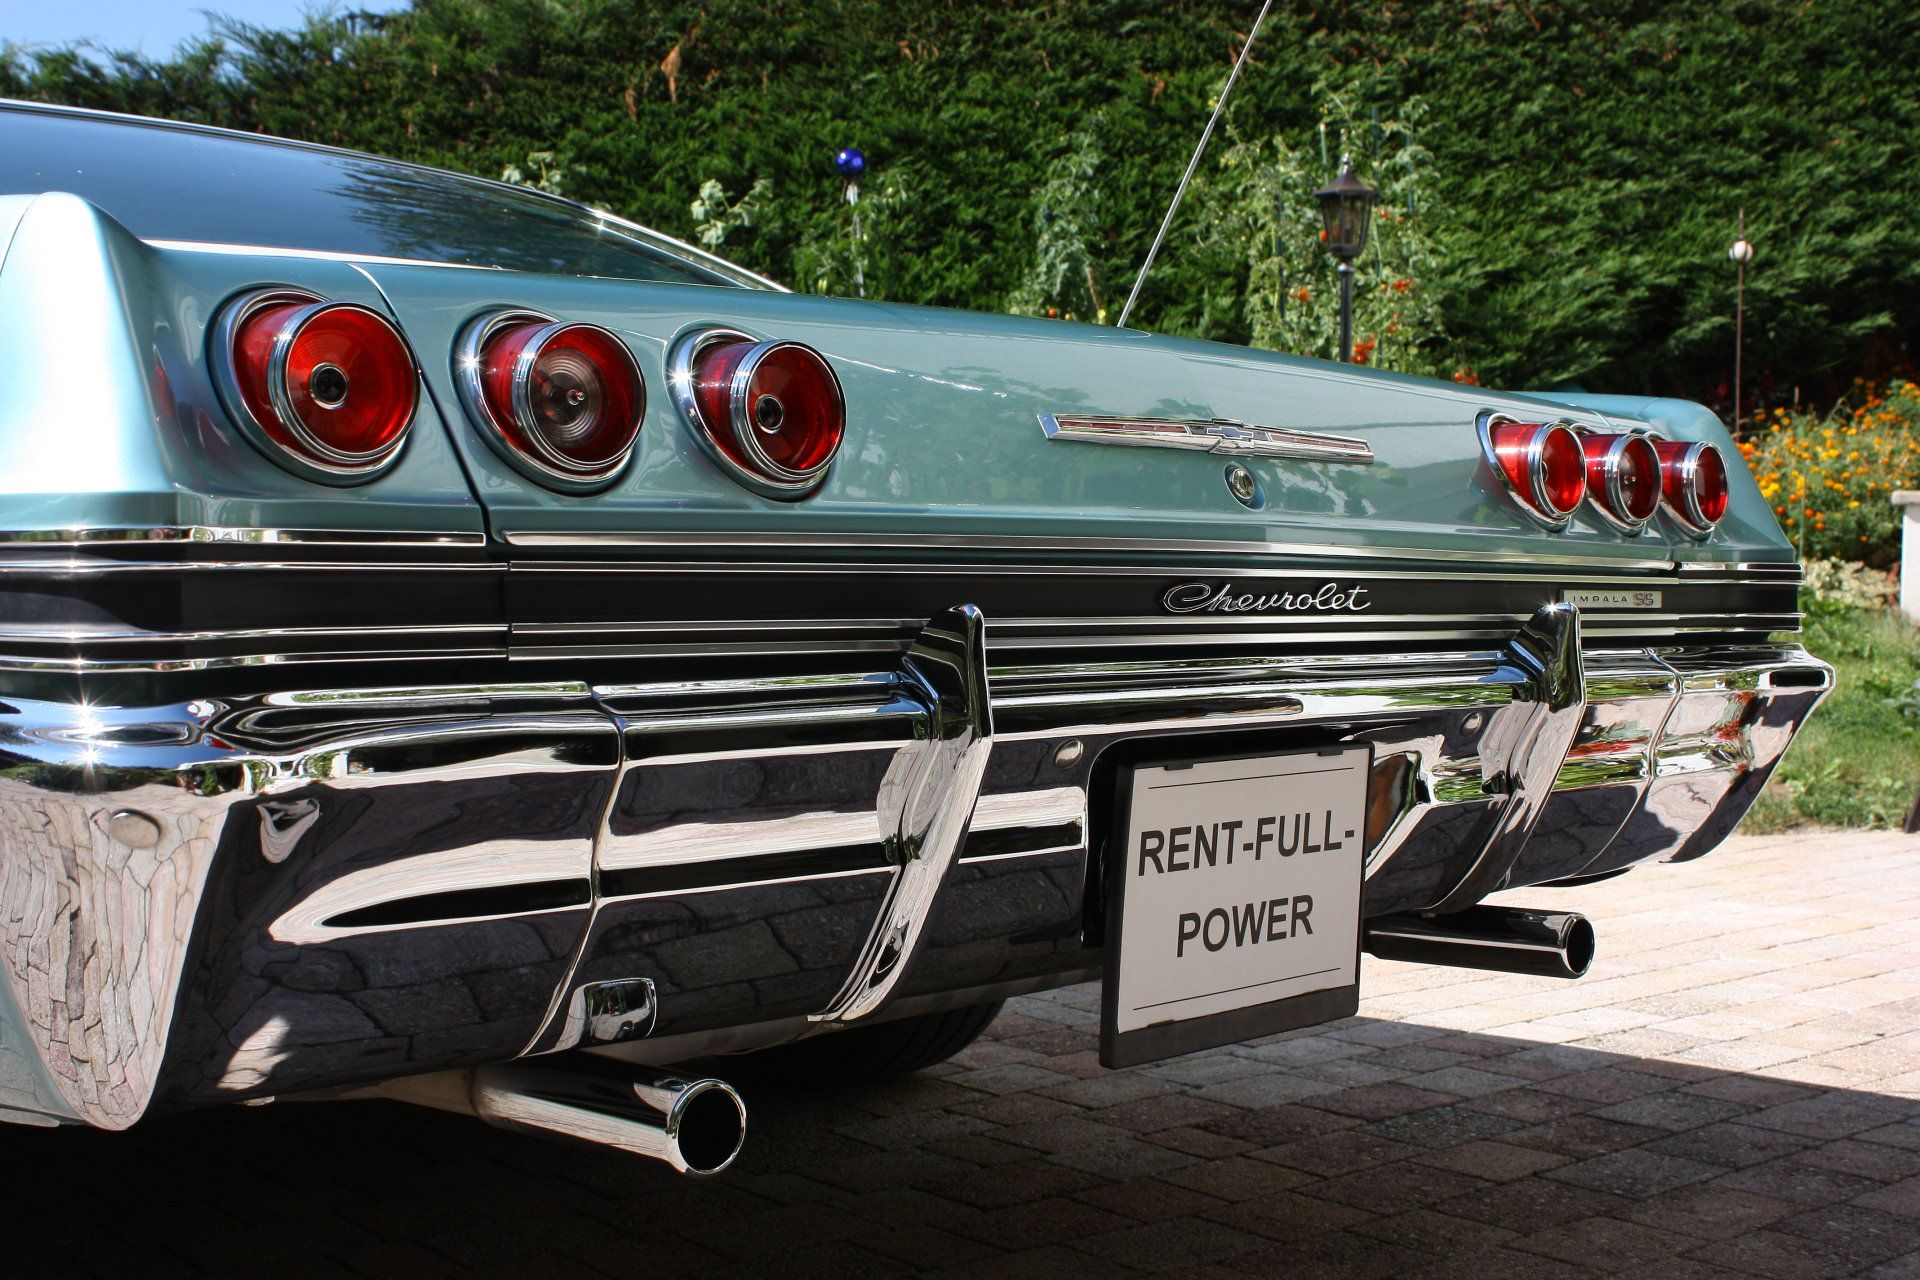 65 chevrolet impala chevrolet impala bj 65 oldtimer ohne begleitperson leihen